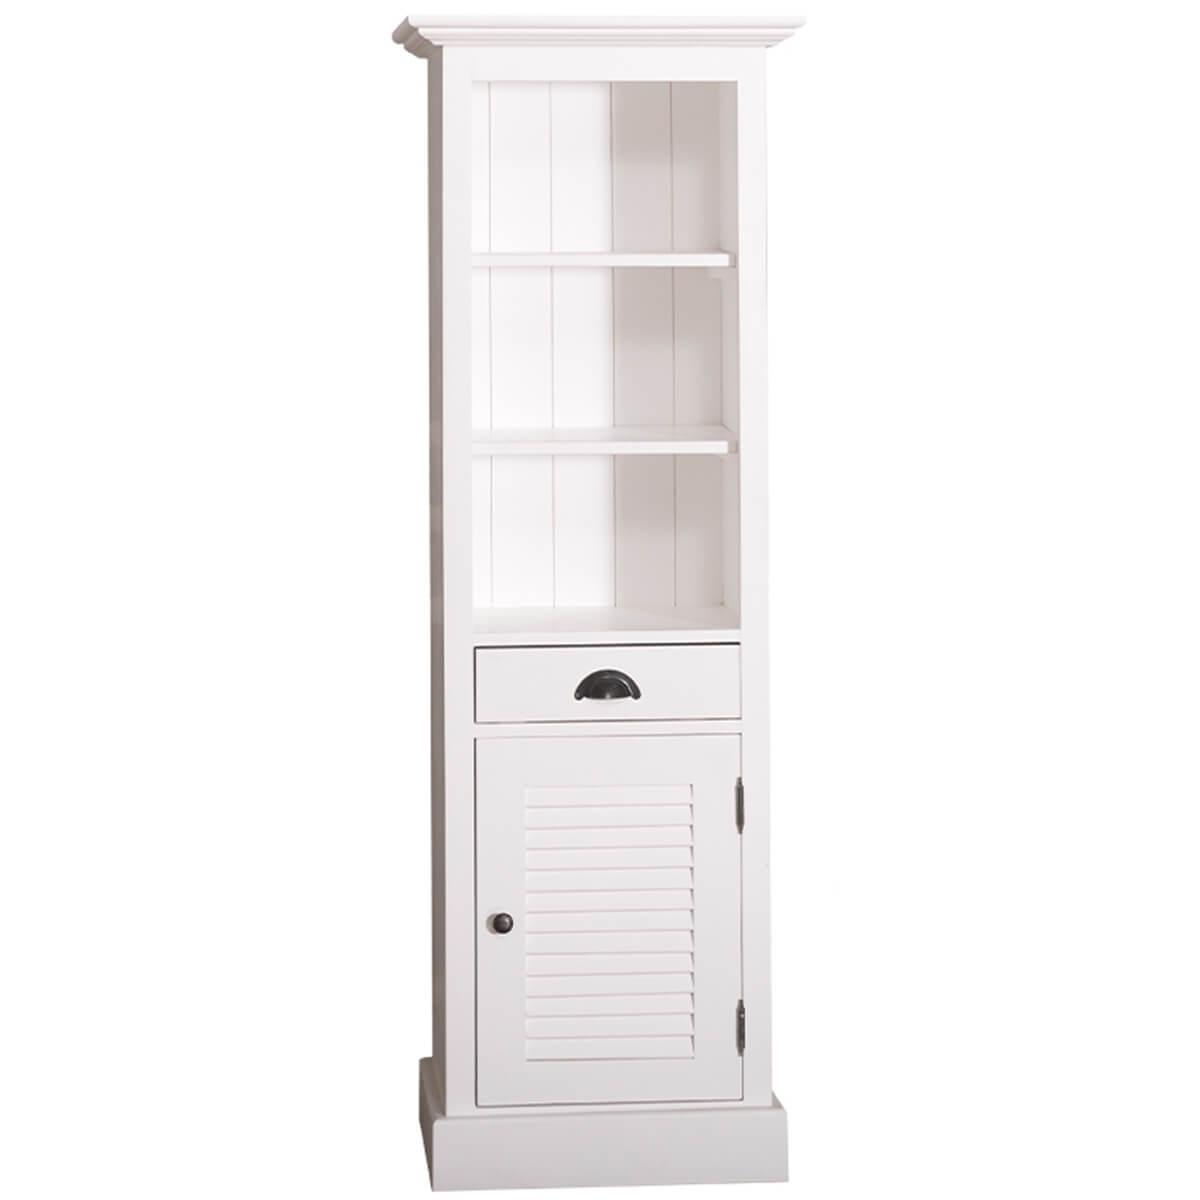 Buy Nicole Bathroom Cabinets Storage Online Dubai Abu Dhabi Uae Cozy Home